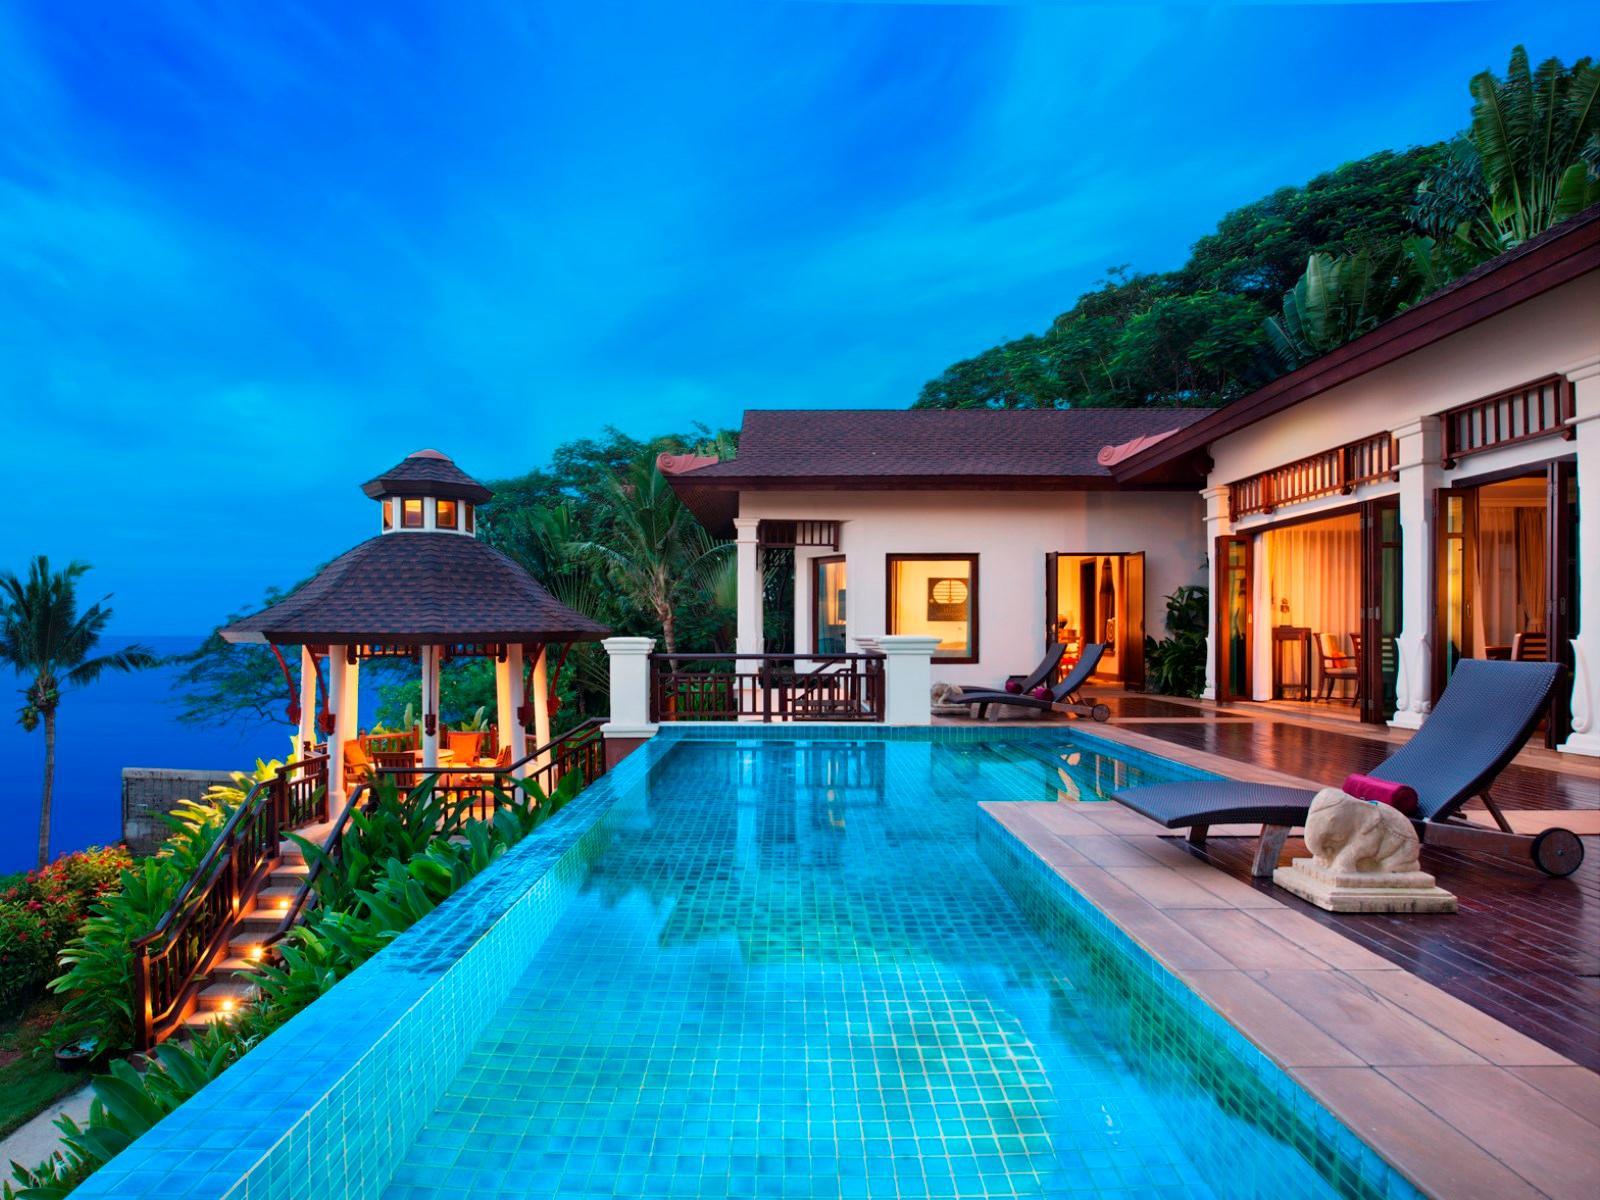 Sheraton Pattaya Resort - Pattaya